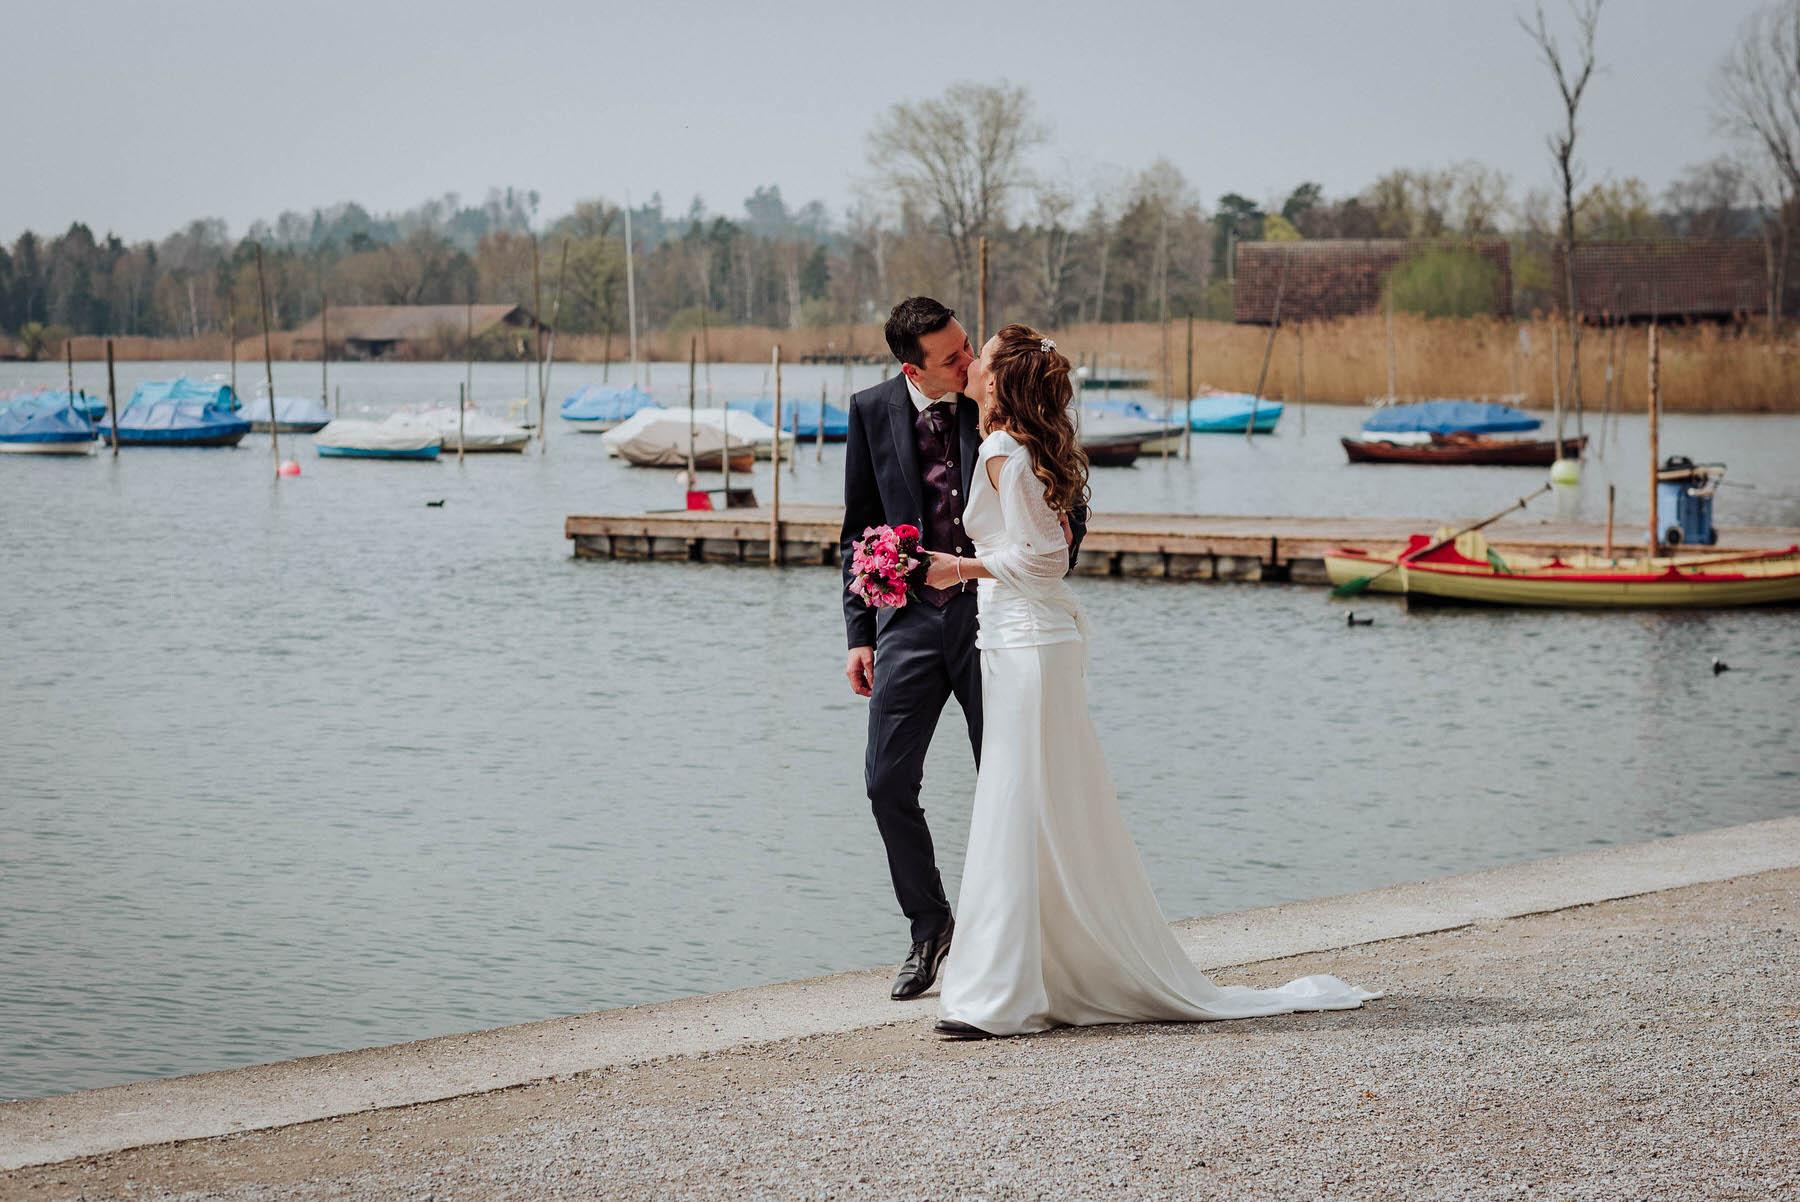 Hochzeitsfotograf am Pfäffikon ZH Trauung